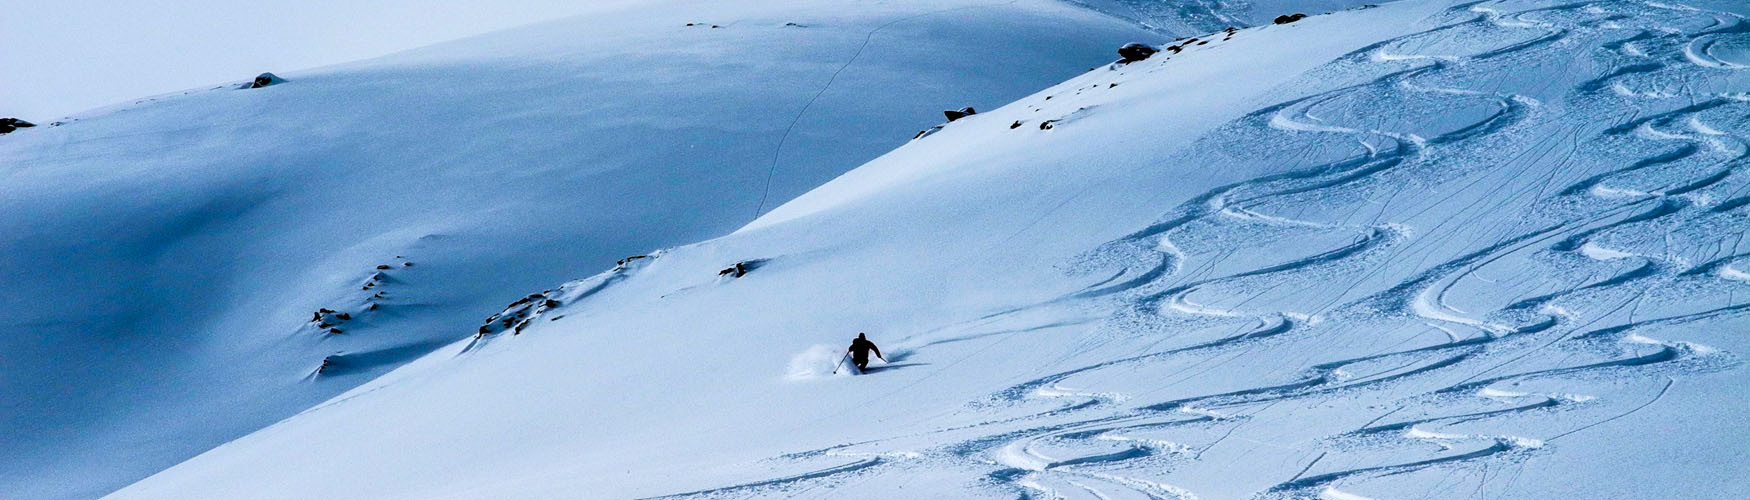 Skitouren und Fahrtraining